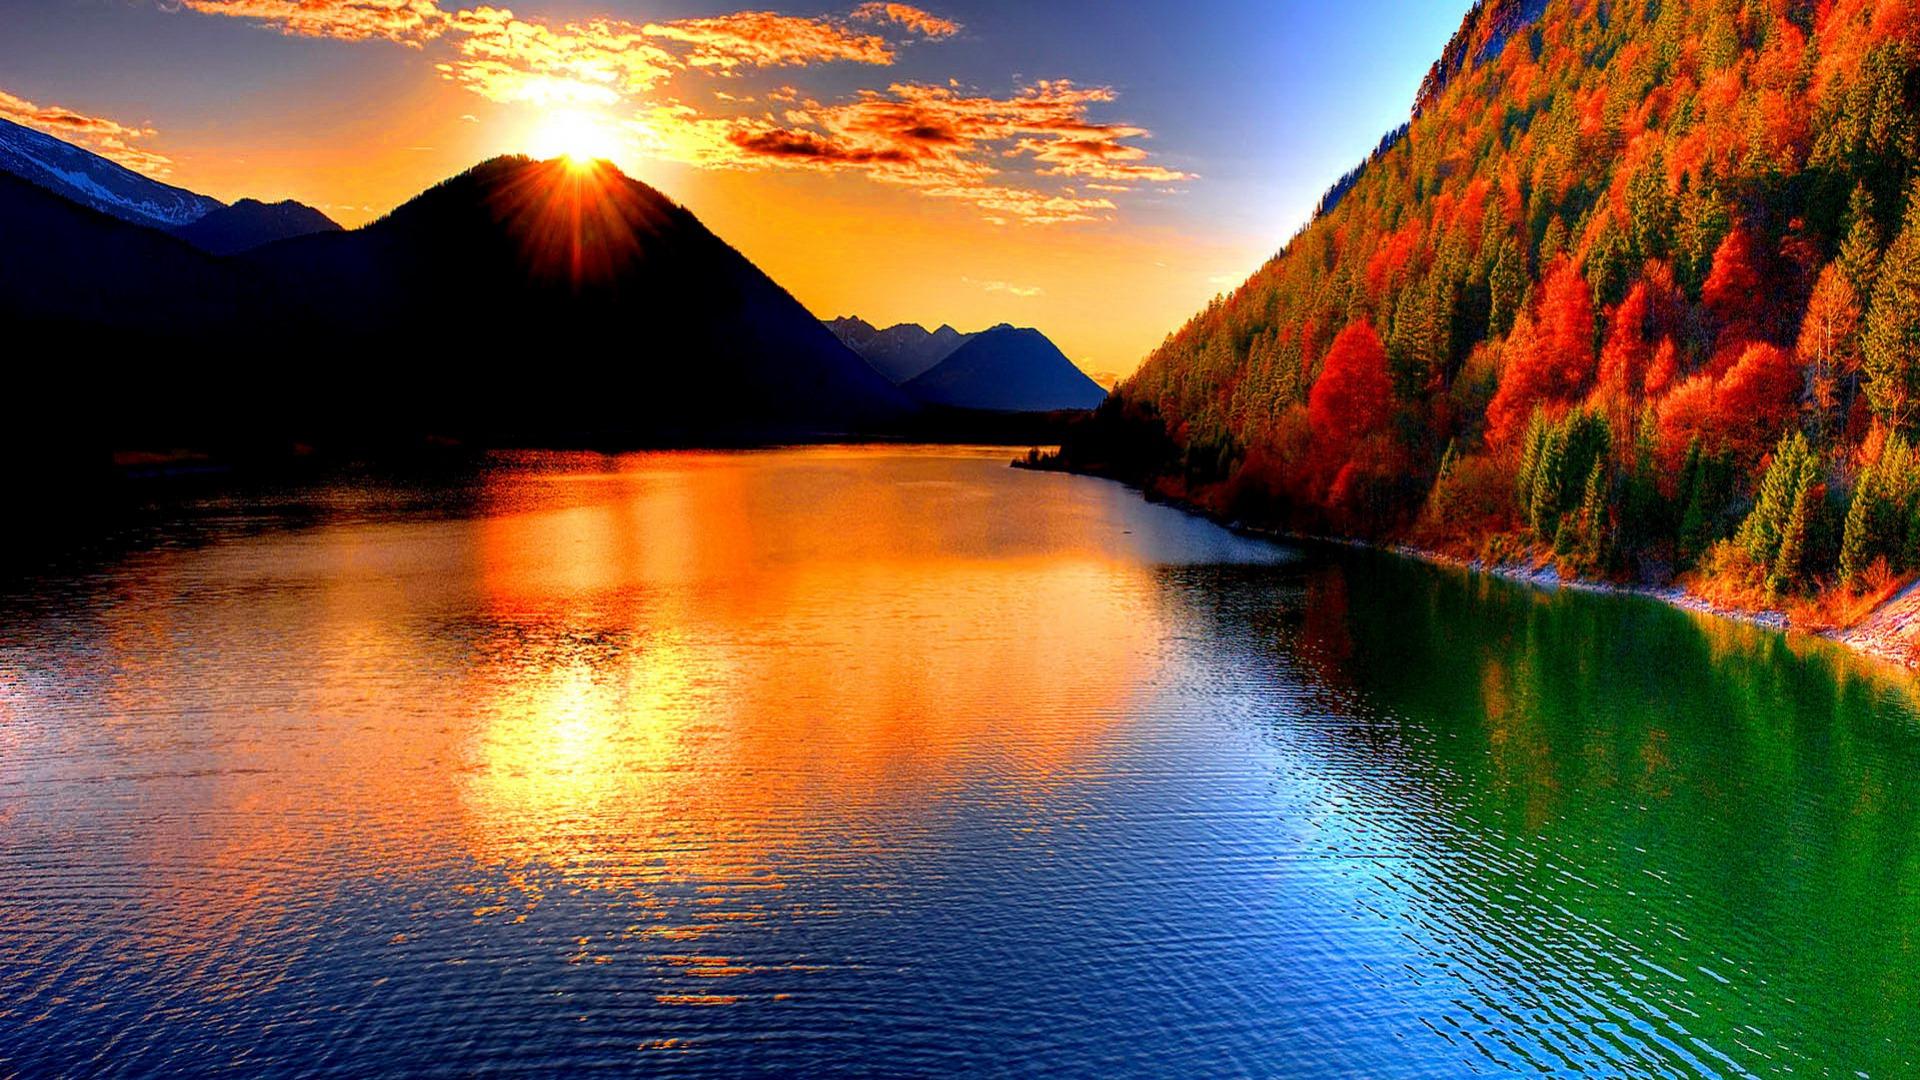 mountains sunset wallpaper